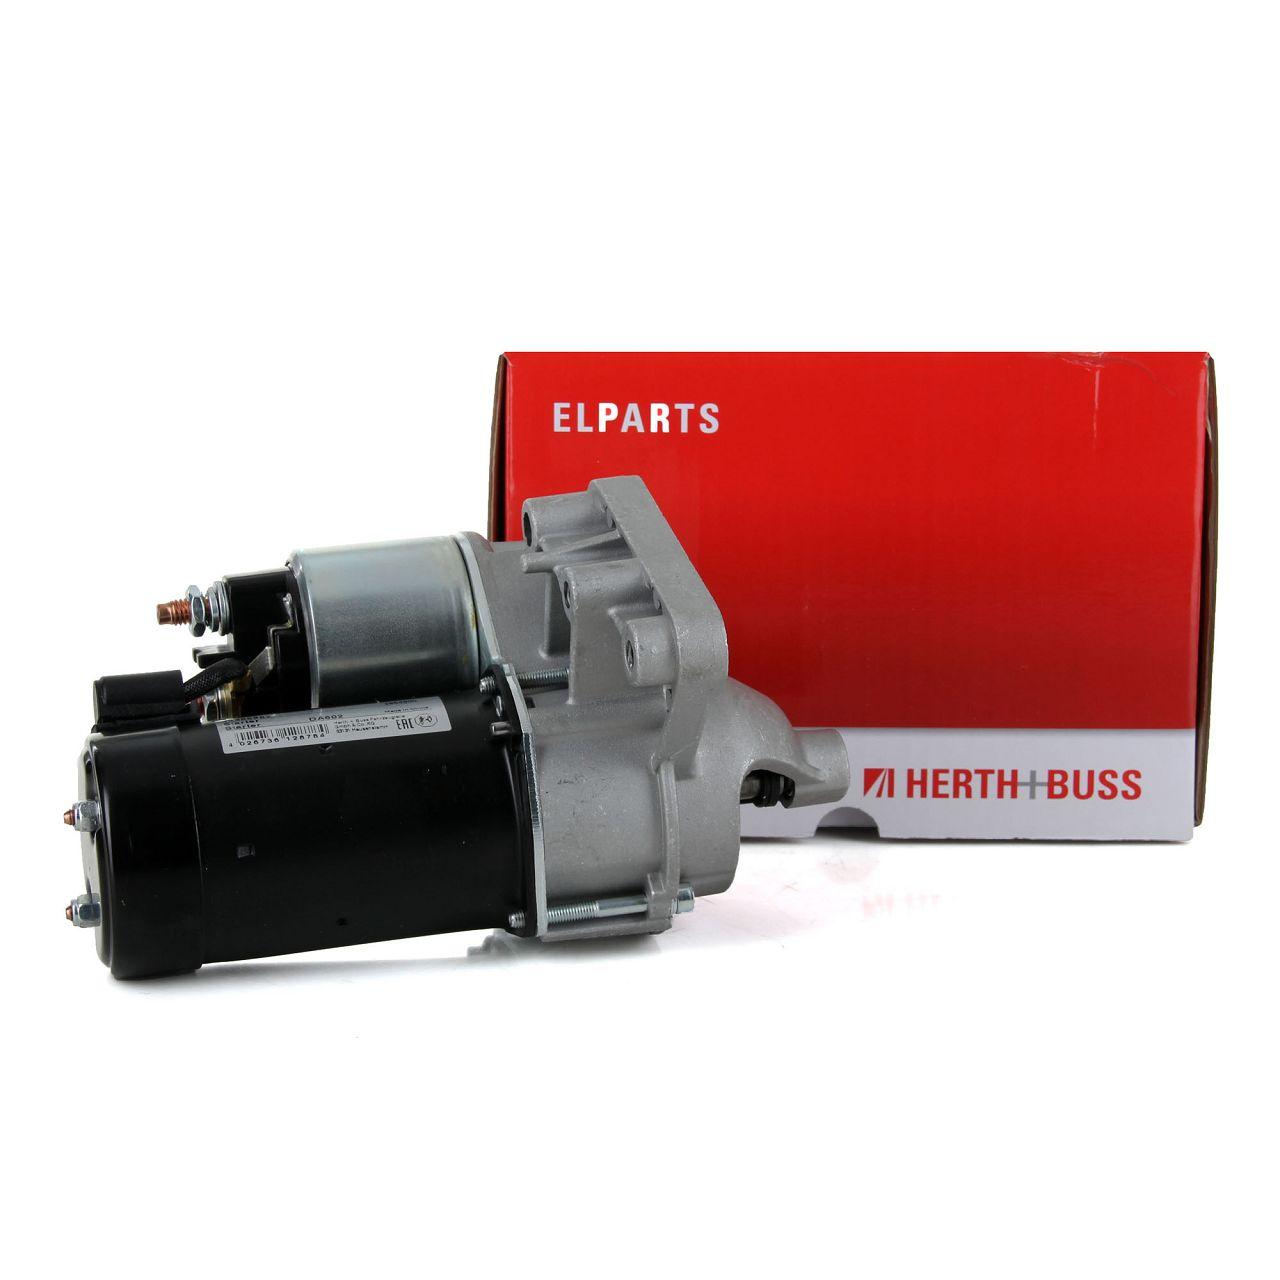 HERTH+BUSS ELPARTS 42455982 Anlasser Starter 12V 1,4kW CITROEN PEUGEOT 1.6HDi